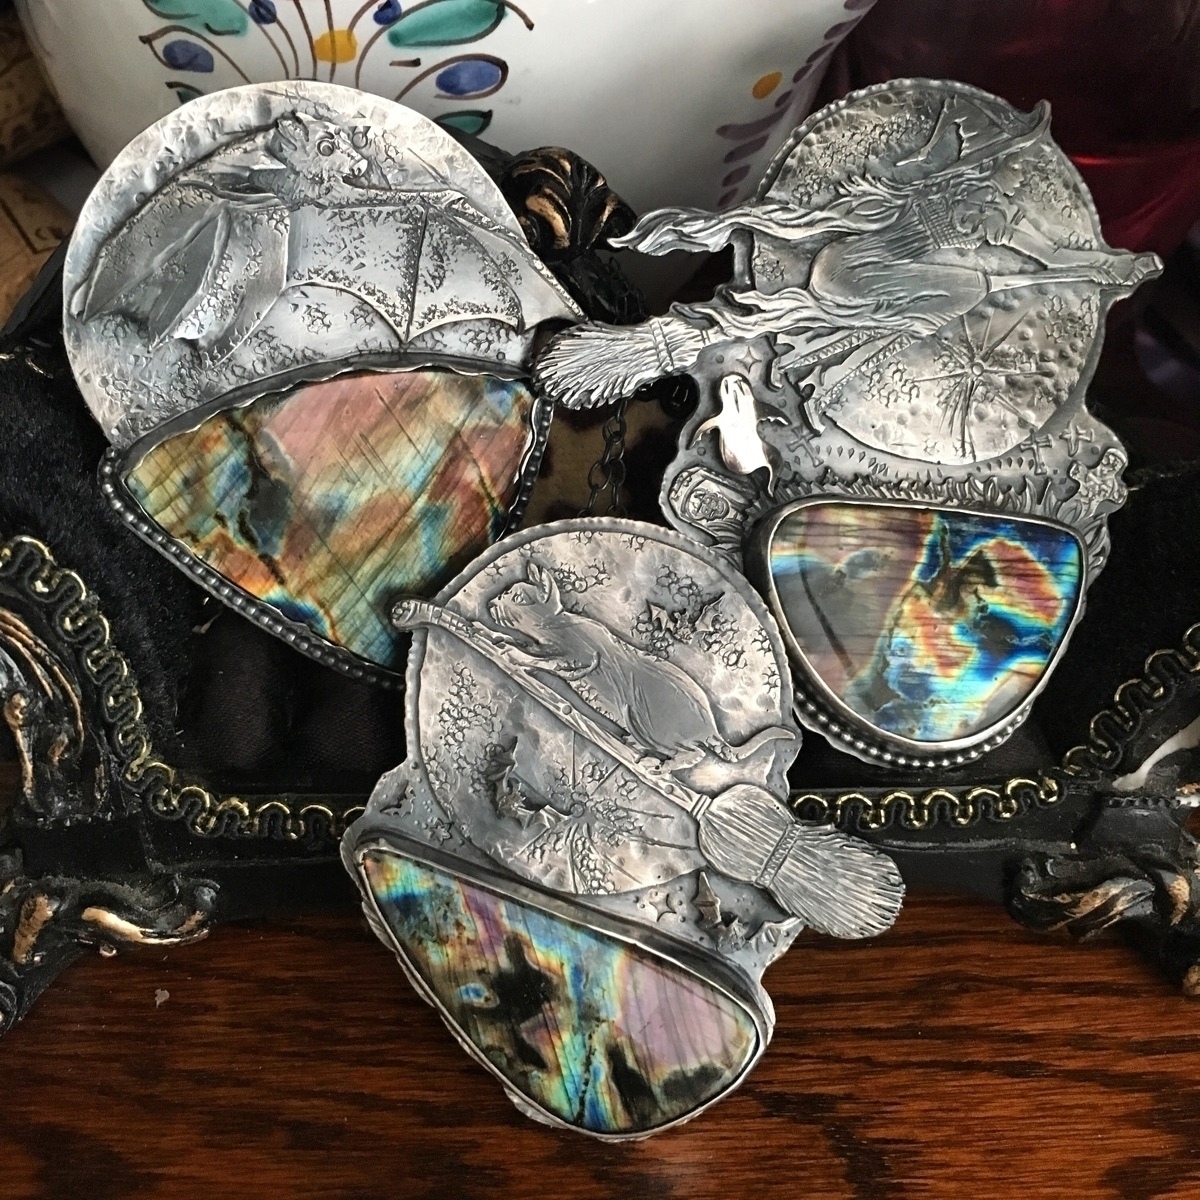 3 gazillion  - thornbirdjewelry - thornbird | ello